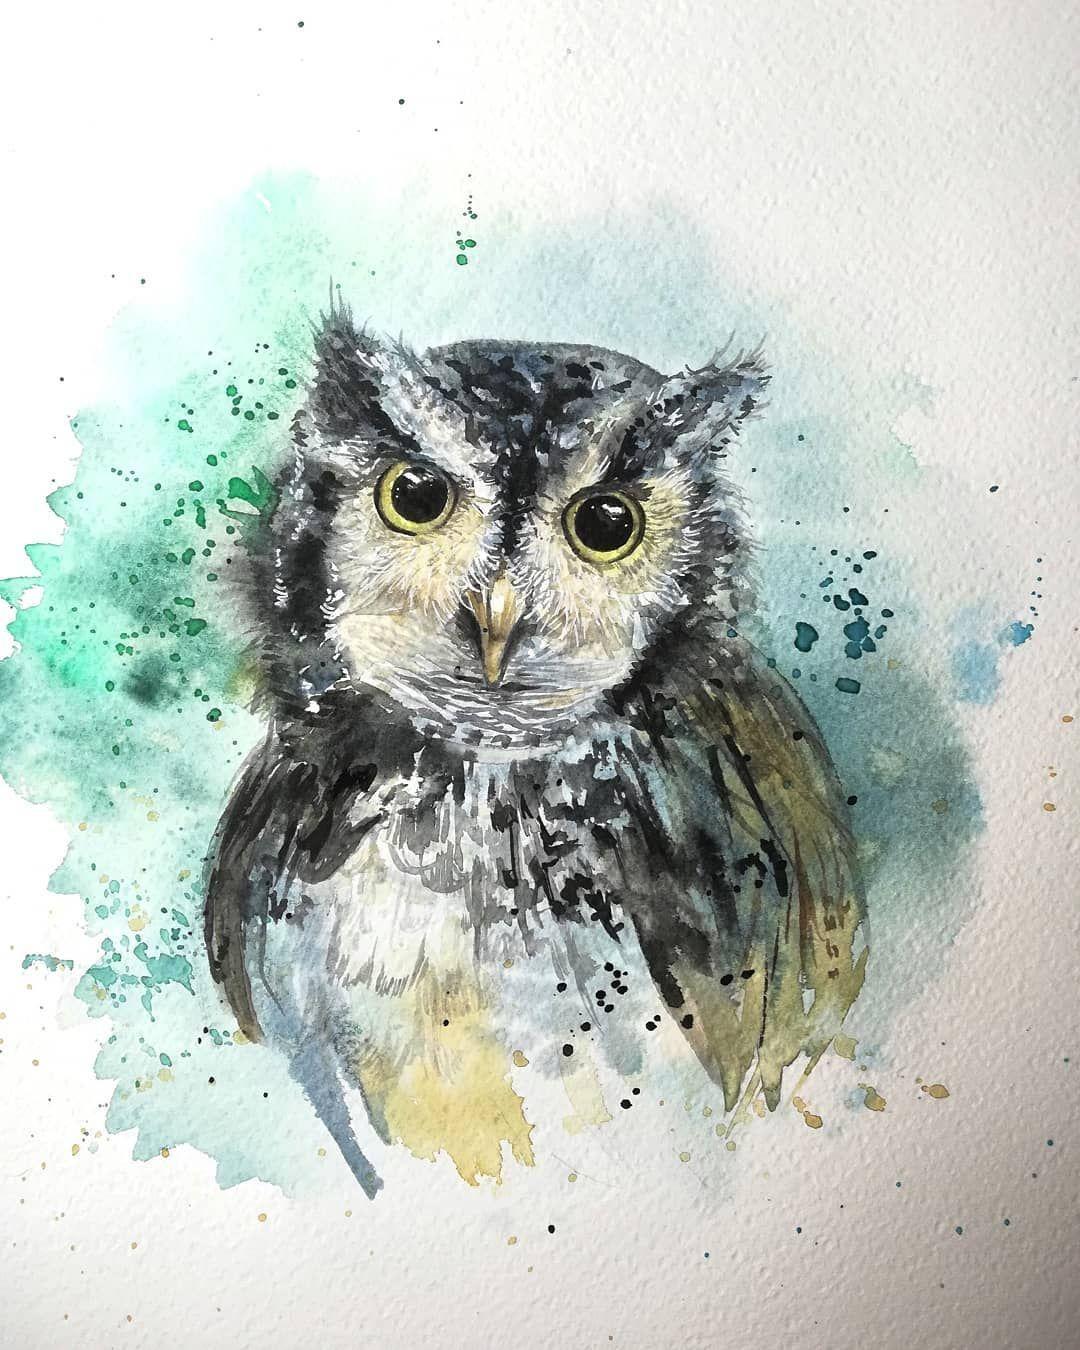 #watercolor #watercolorillustration #watercolorpaintings #painting #artoninstagram #artoftheday #artwork #loveanimals#peintureaquarelle #animalillustration #drawing #hibou